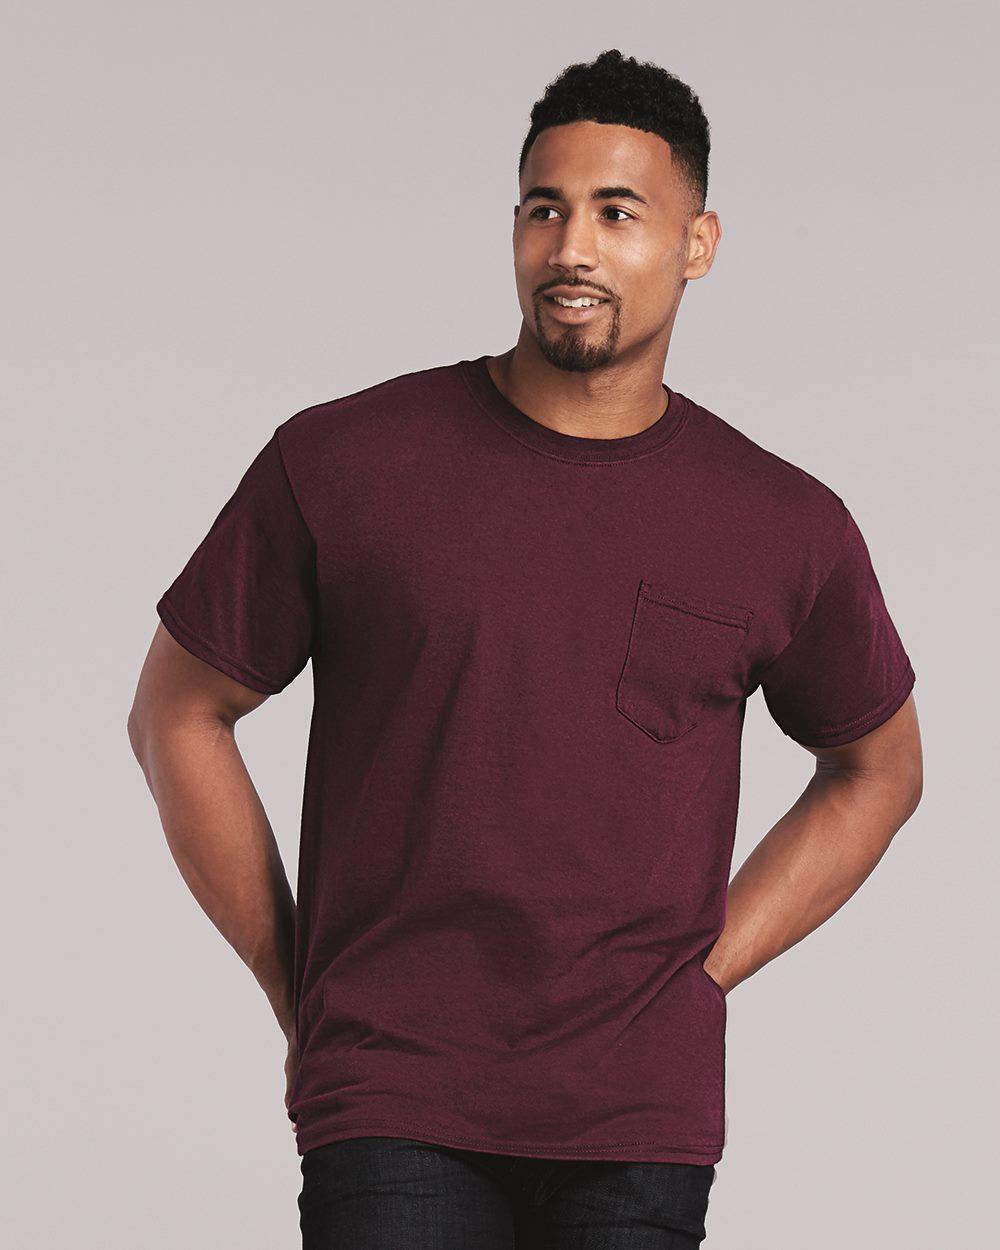 Gildan 2300 Ultra Cotton T-Shirt with a Pocket